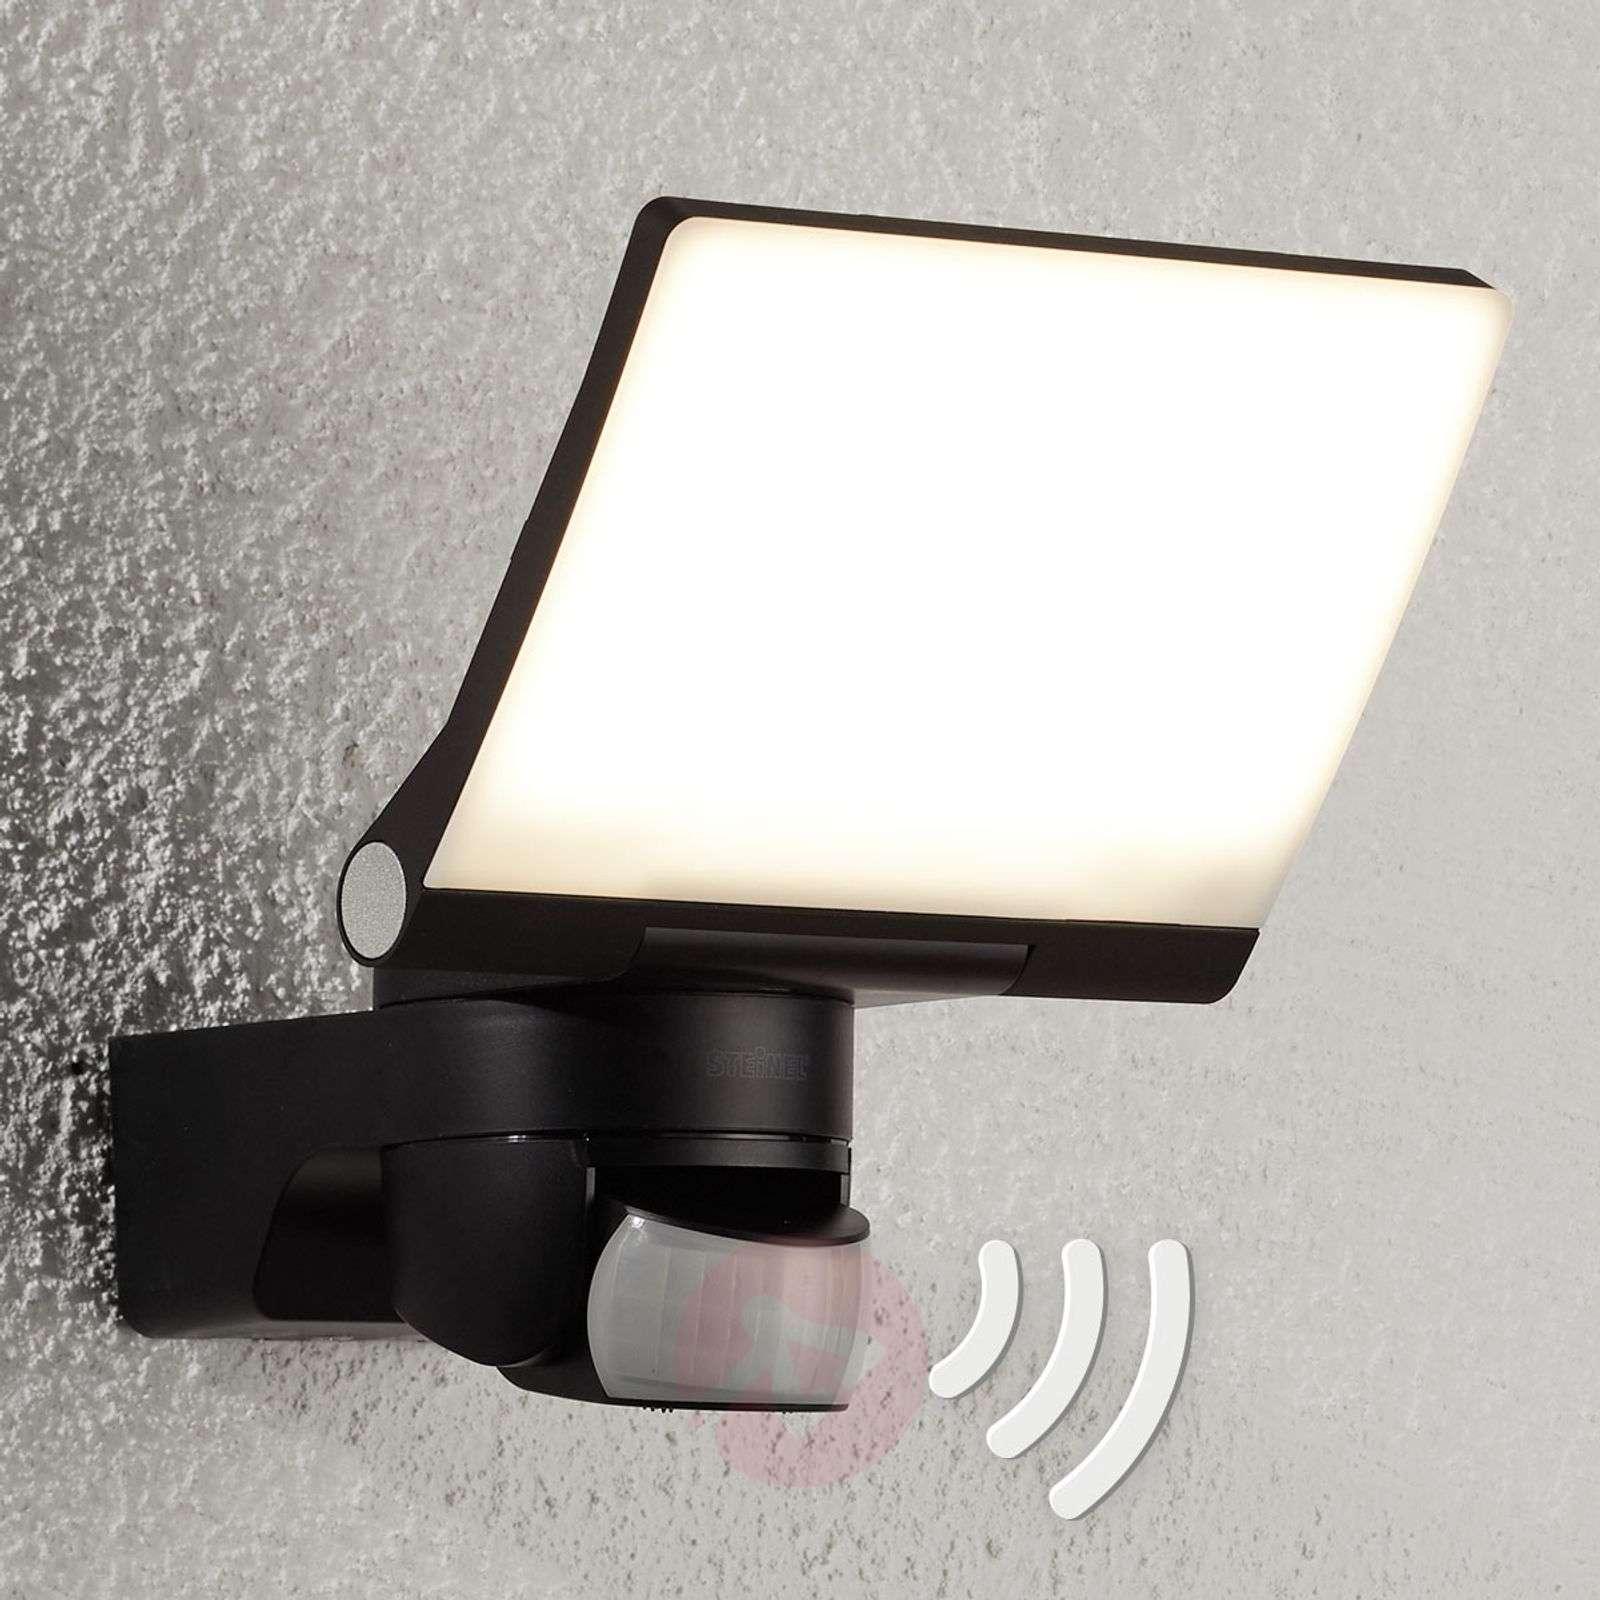 Innovatiivinen LED-ulkoseinäval. XLED Home 2 XL-8505696-01